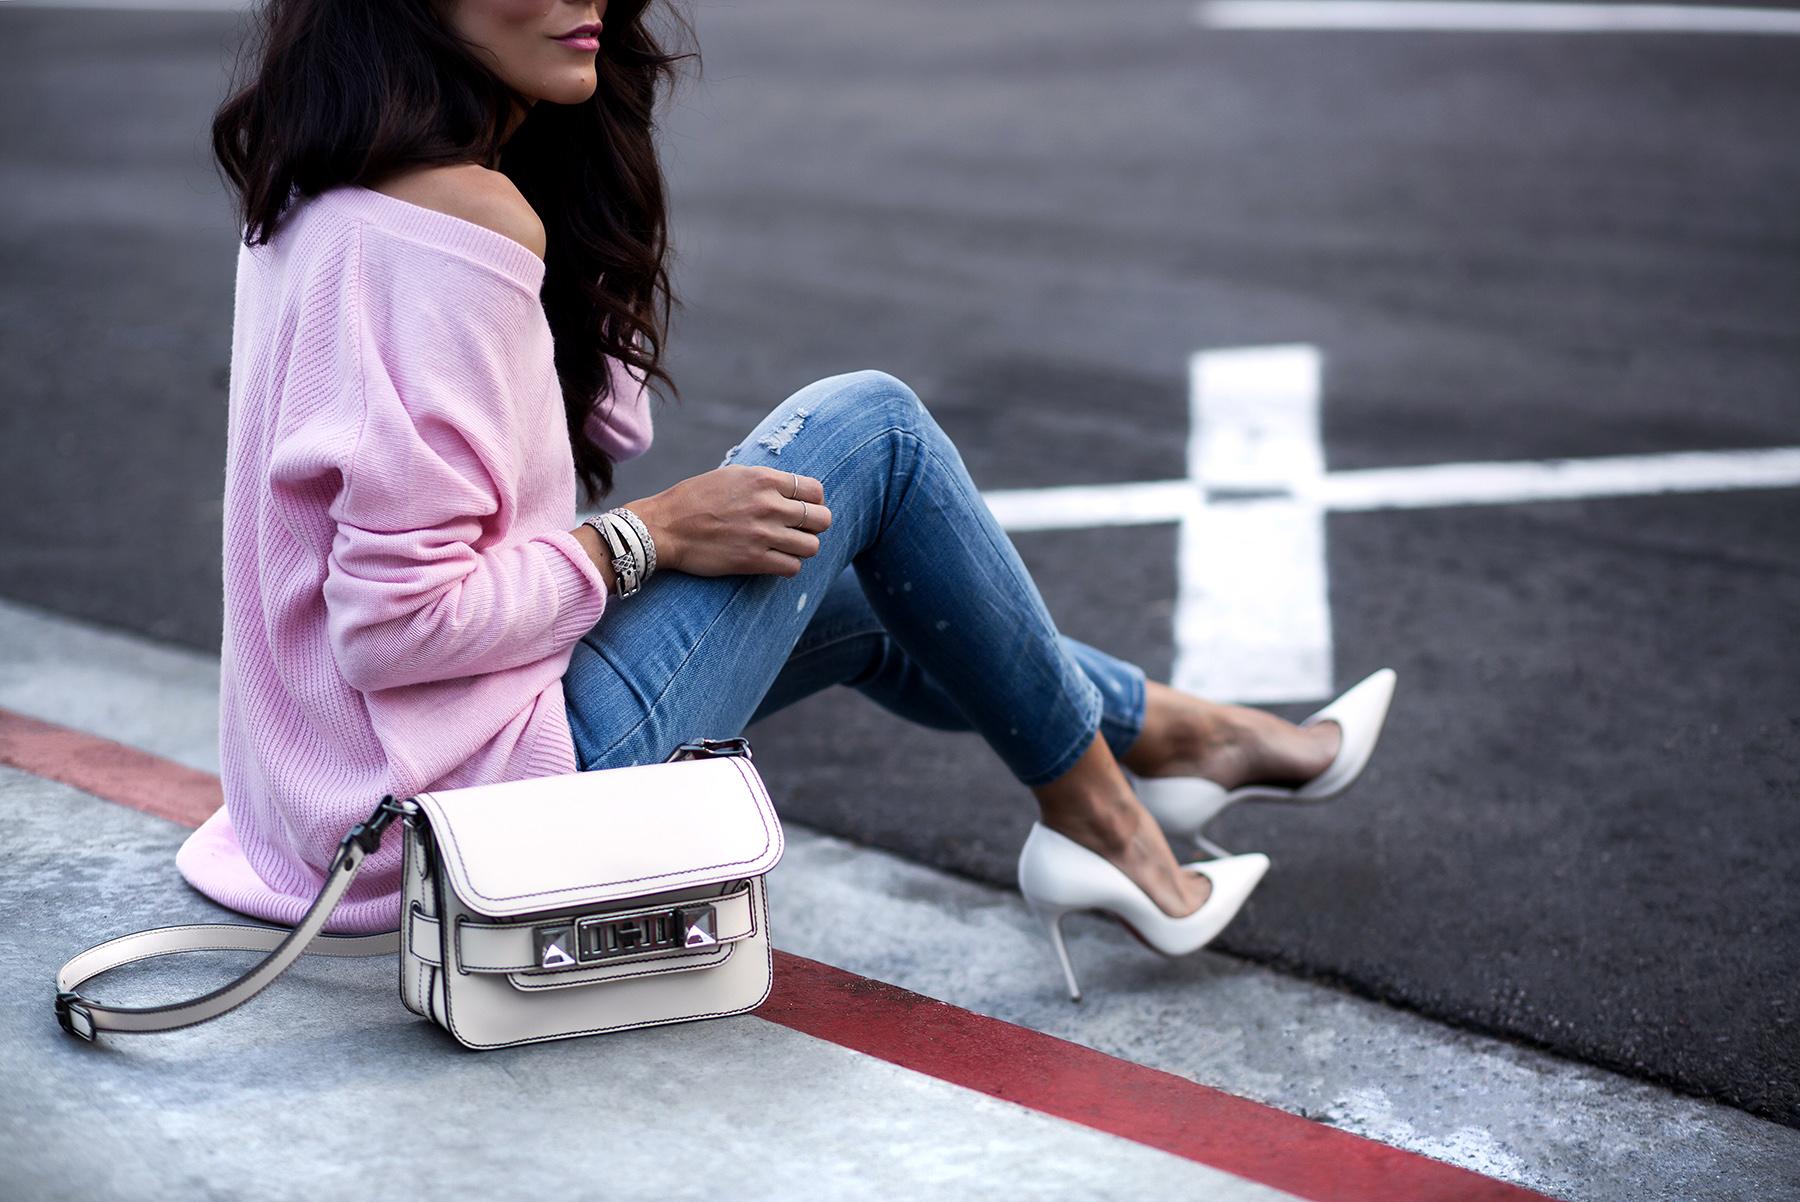 Pink_Sweater_Spring_Fashion_Unpublished_Denim_Proenza_Schouler_Bag_Christian_Louboutin.jpg